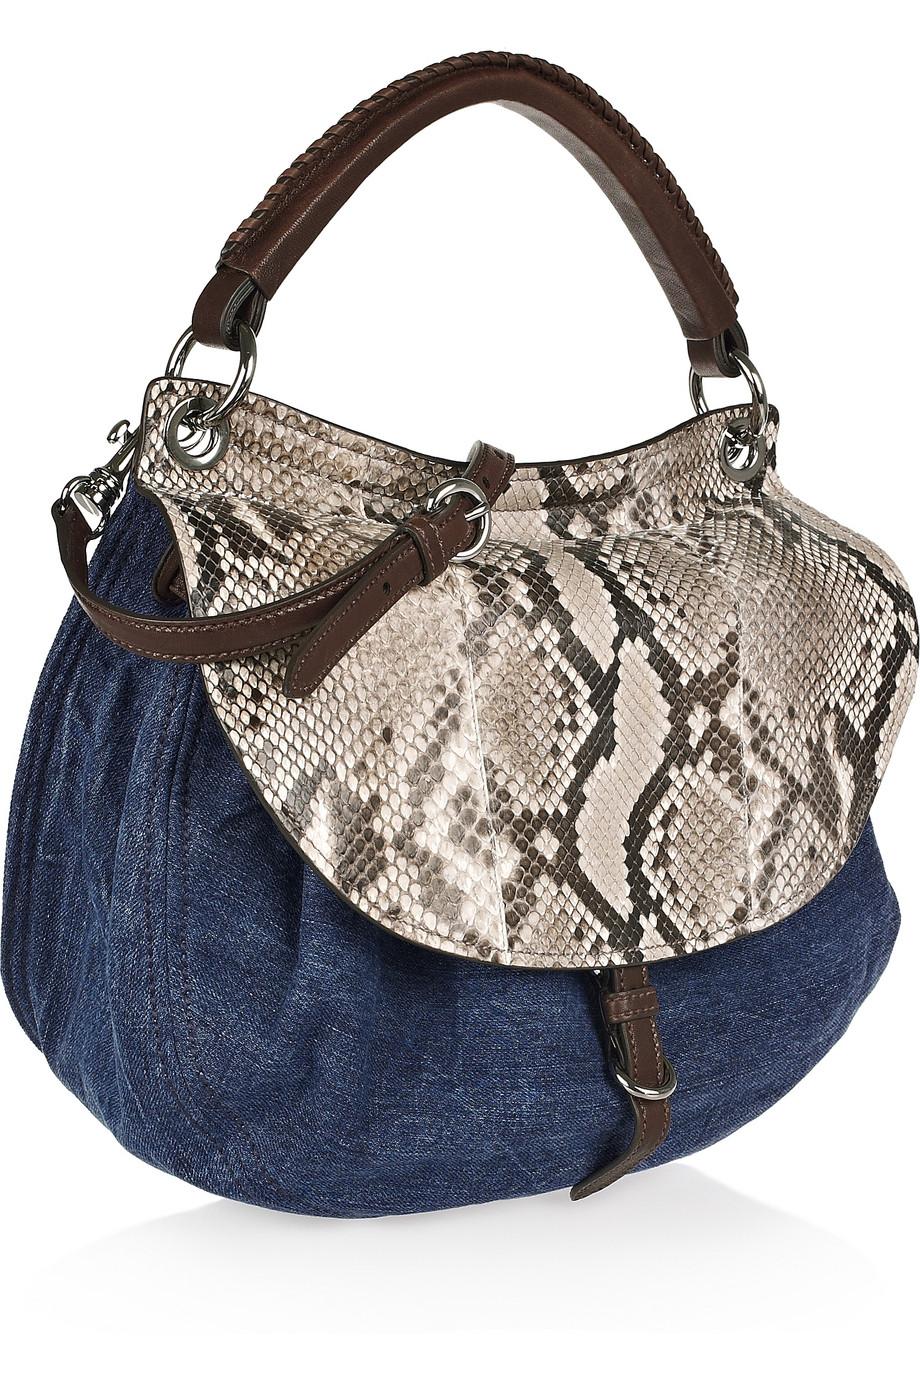 Lyst miu denim and python shoulder bag in blue jpg 920x1380 Miu python tote e2b9d03692144